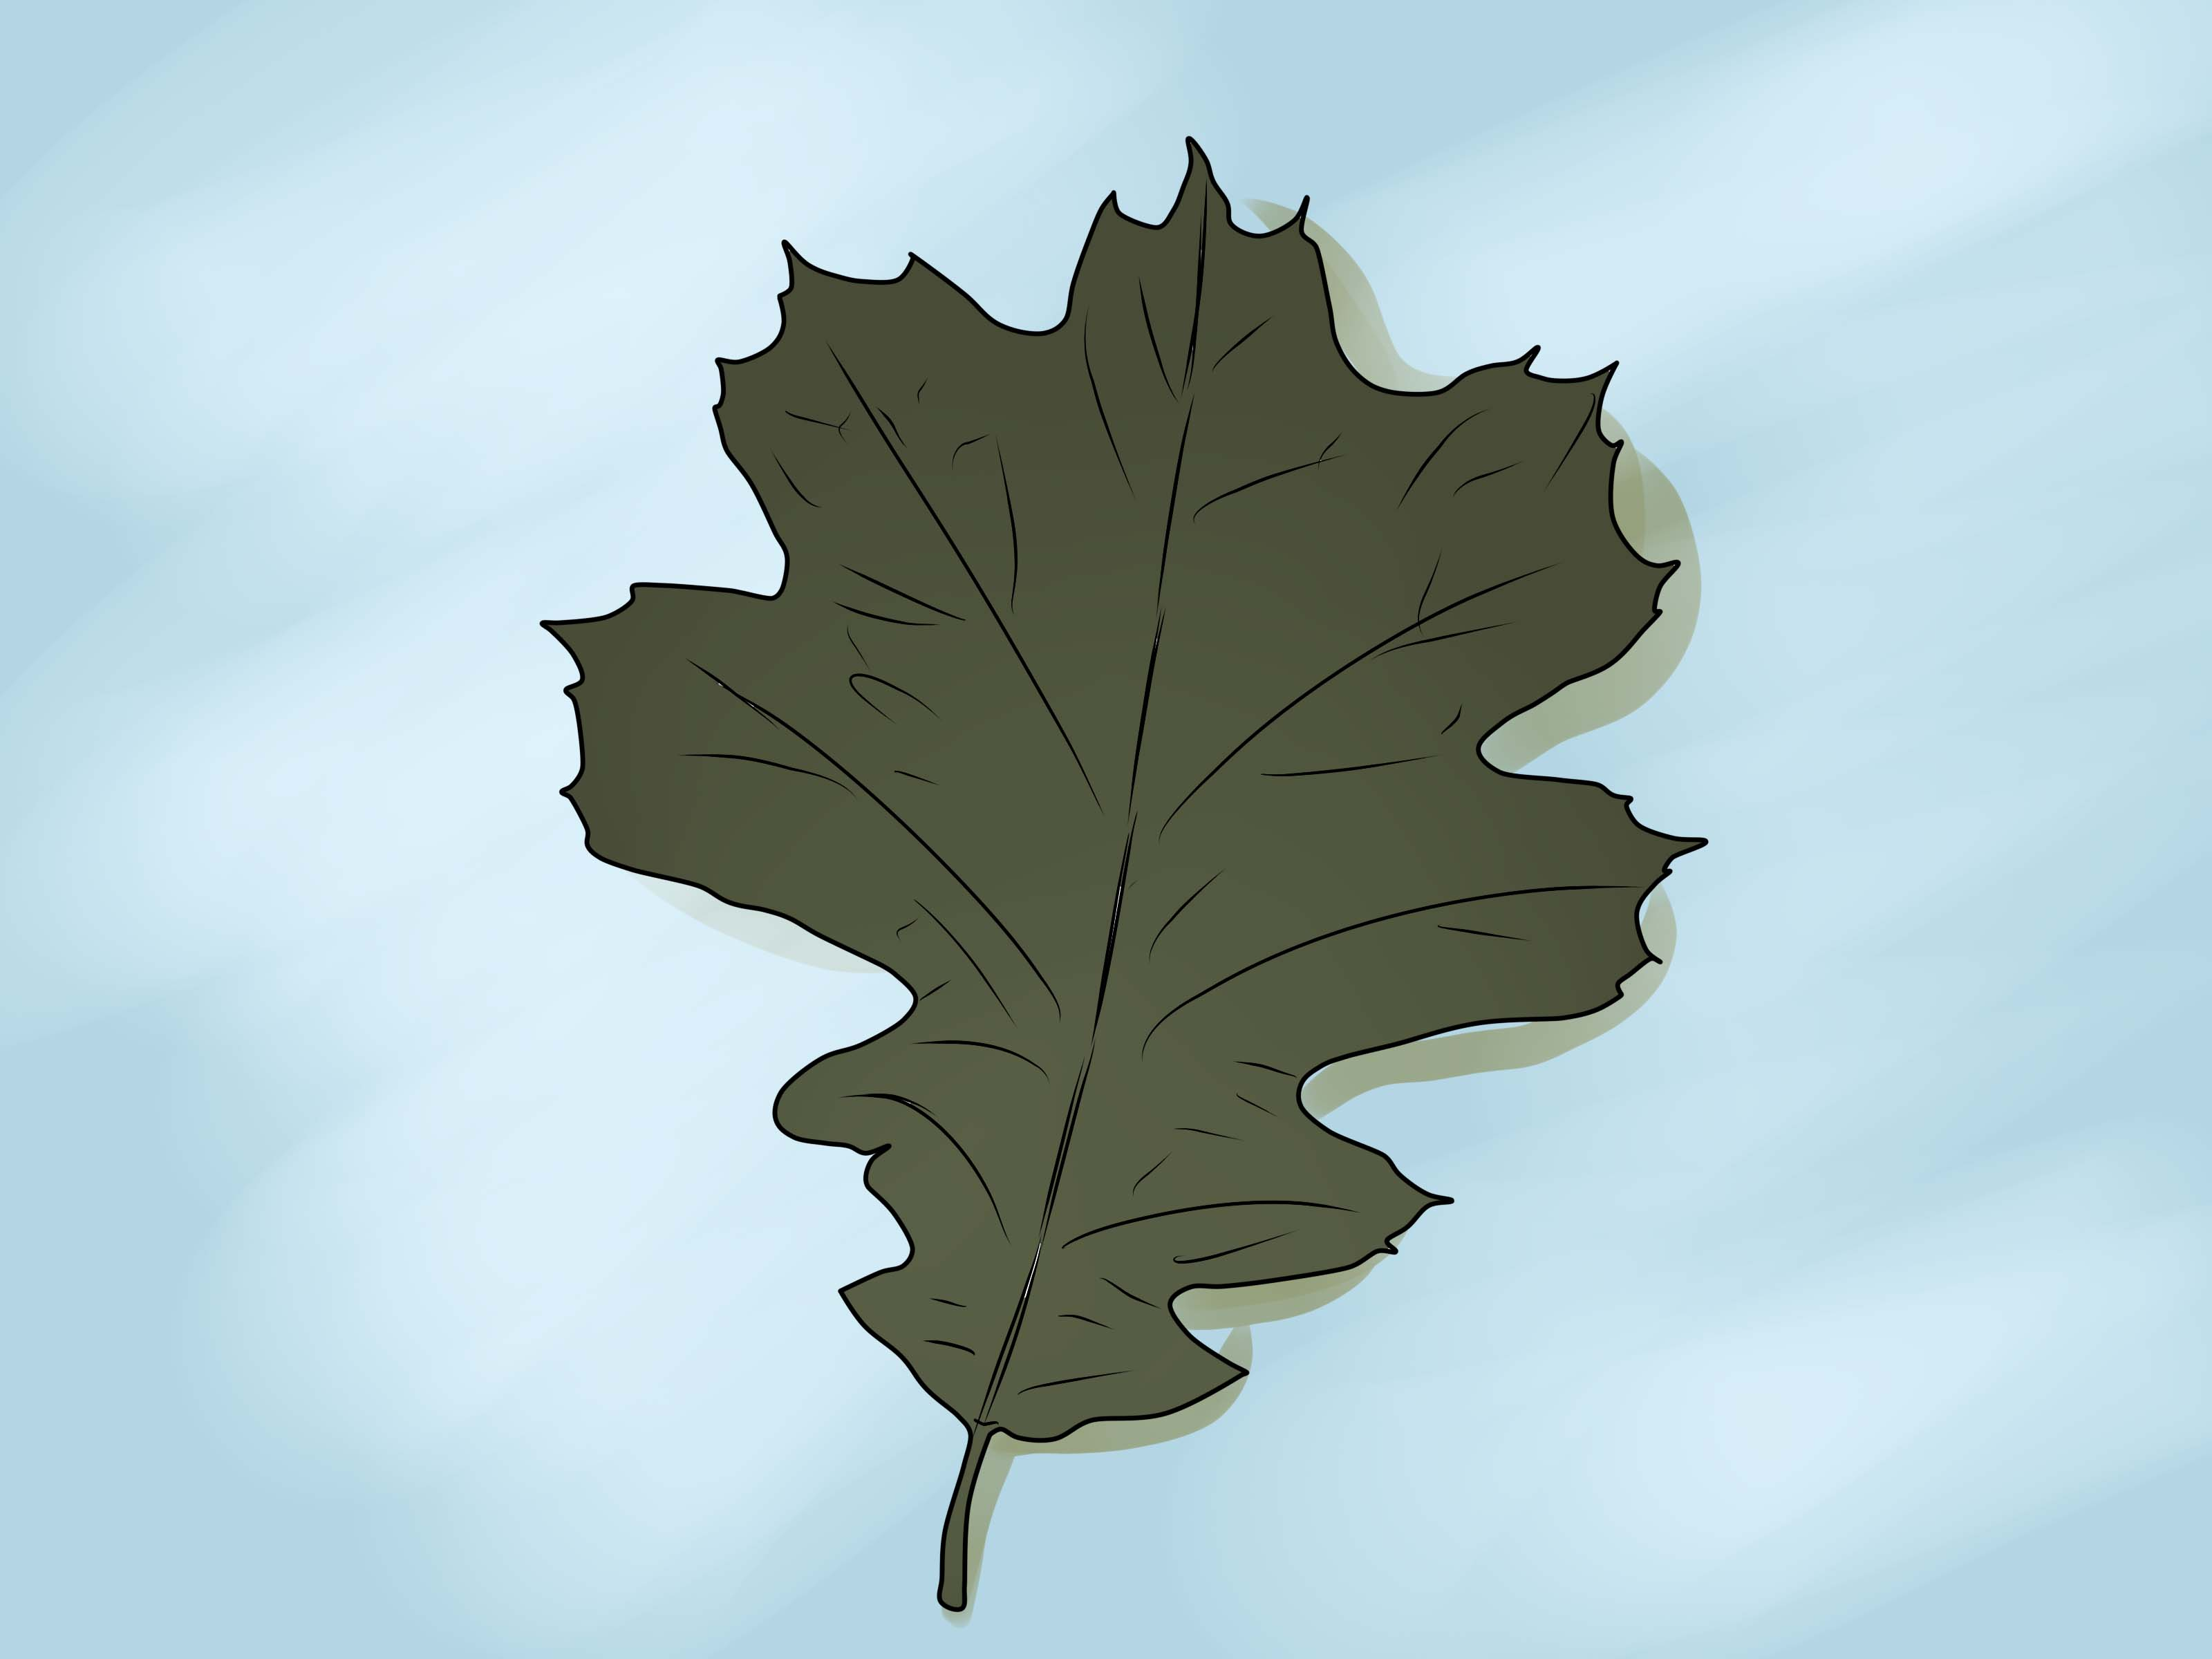 Charming How To Identify Oak Leaves Wikihow Live Oak Leaves S Live Oak Leaves Turning Yellow houzz-02 Live Oak Leaves